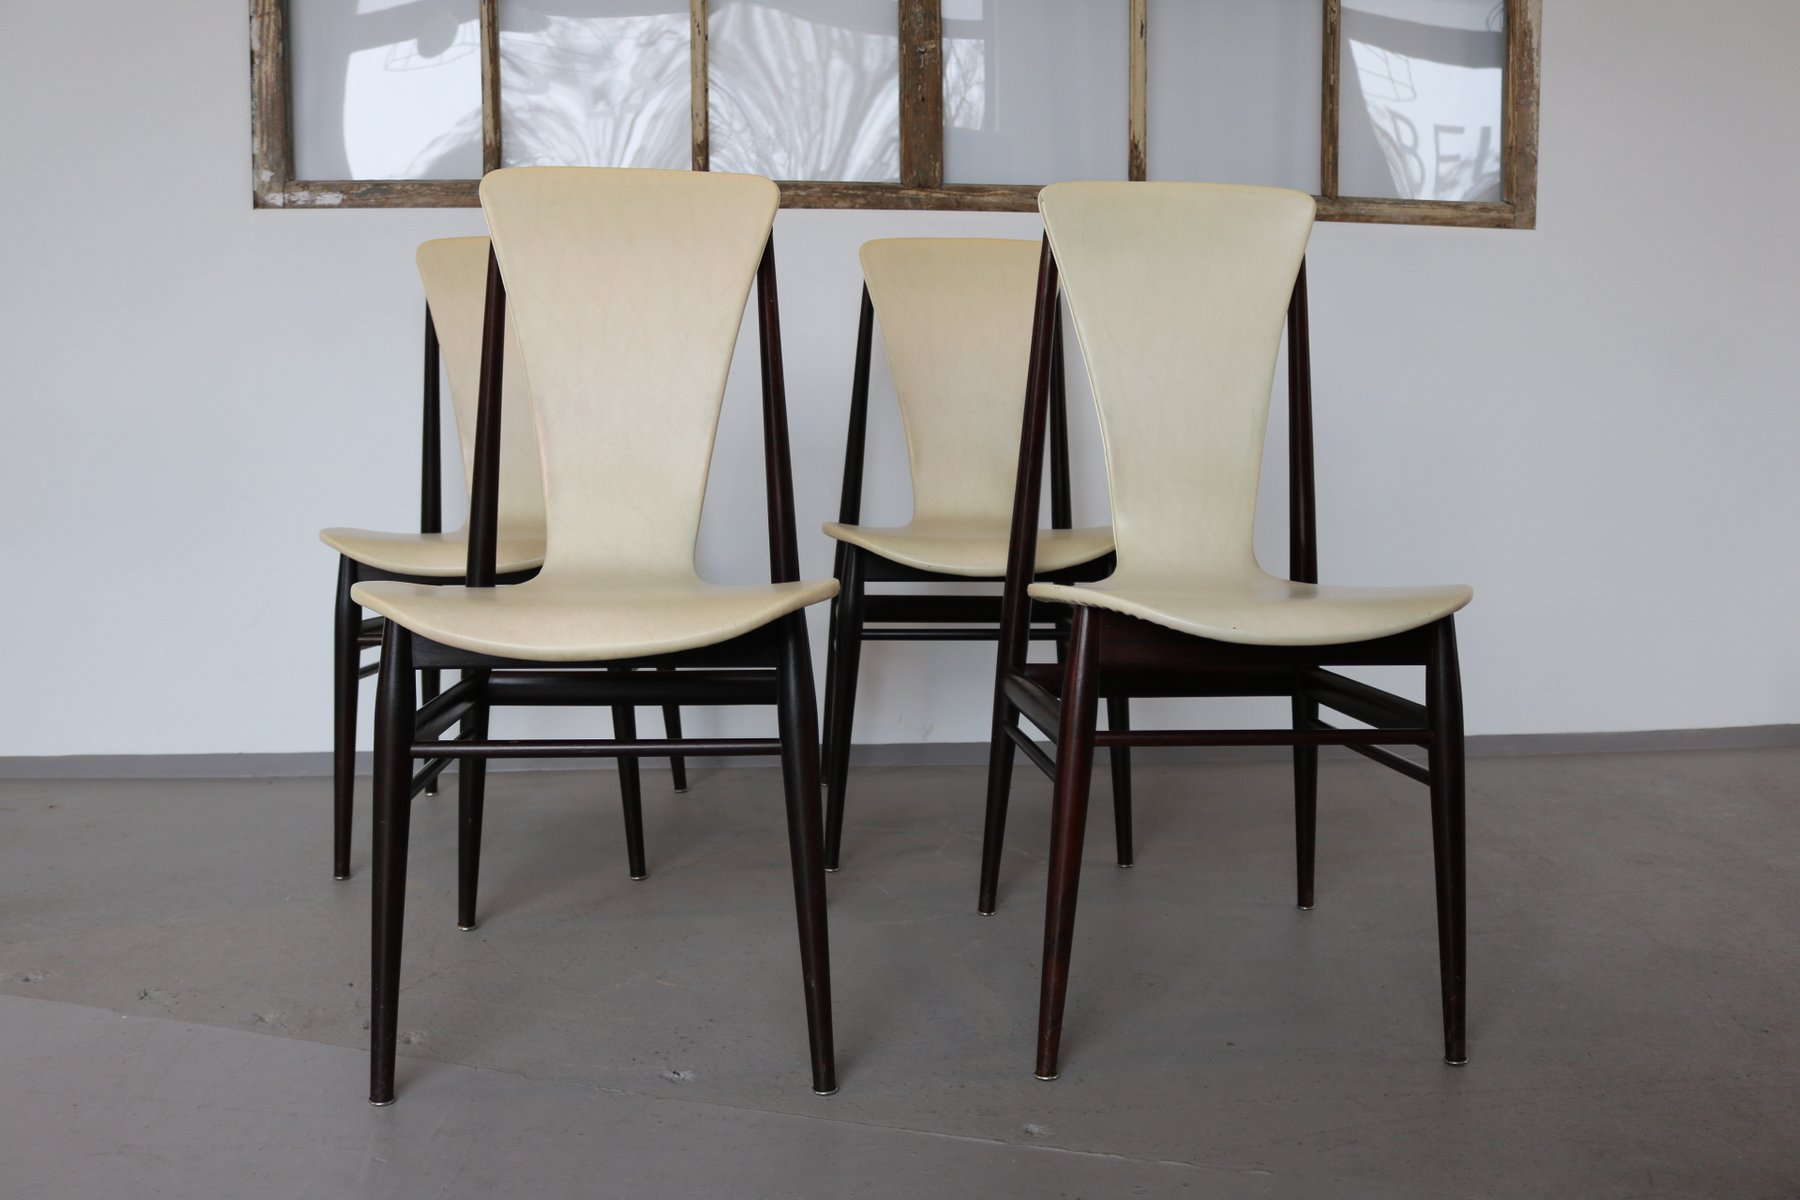 italienische teak st hle 1960er 4er set bei pamono kaufen. Black Bedroom Furniture Sets. Home Design Ideas